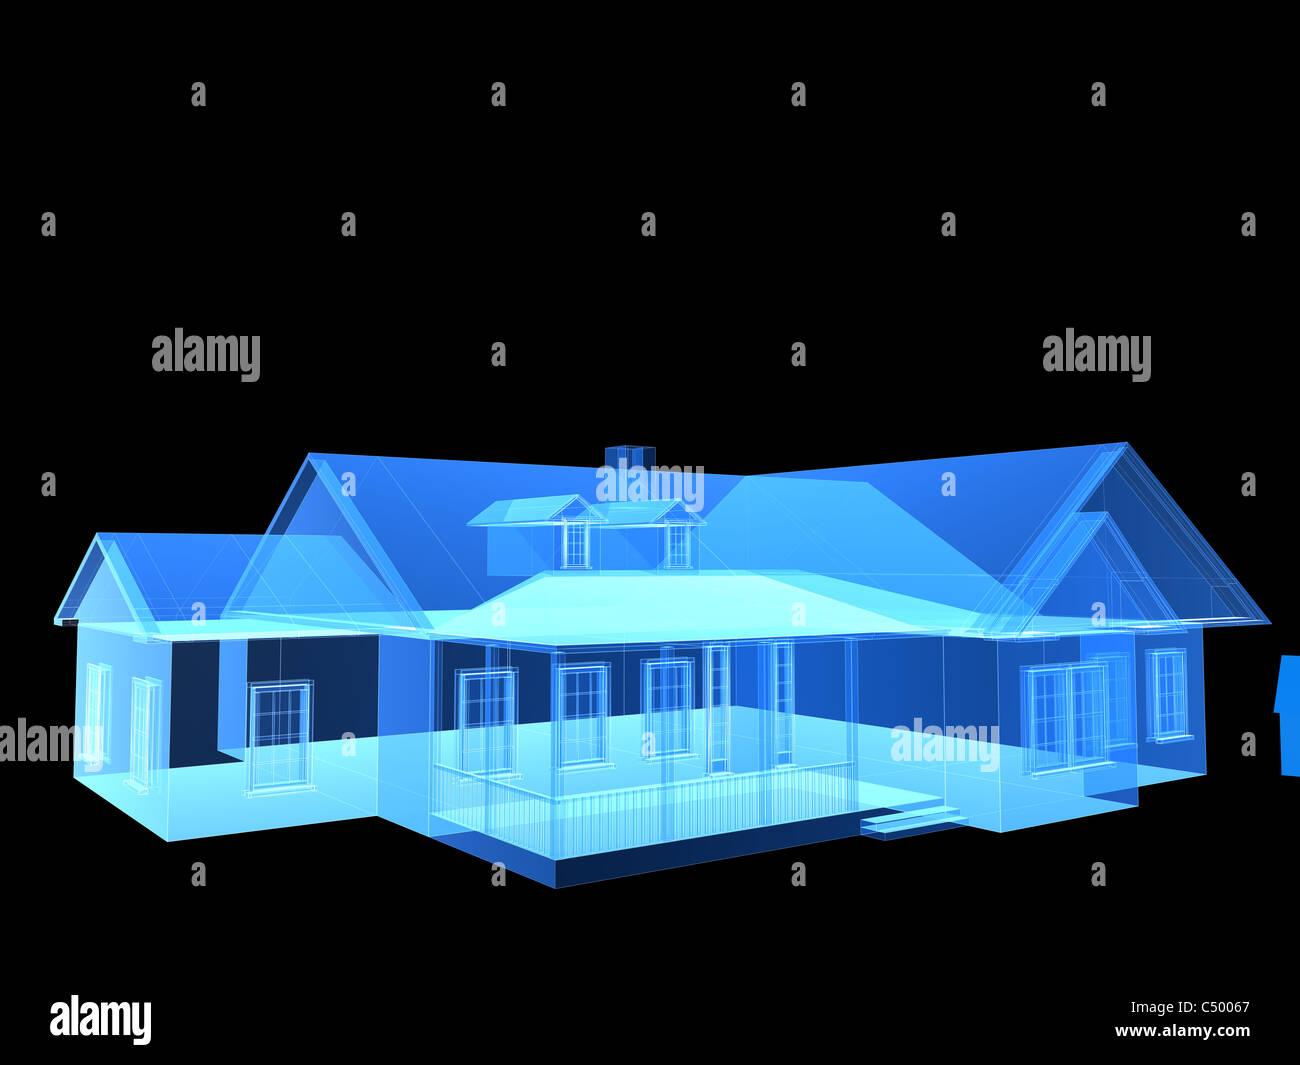 X-ray house - Stock Image